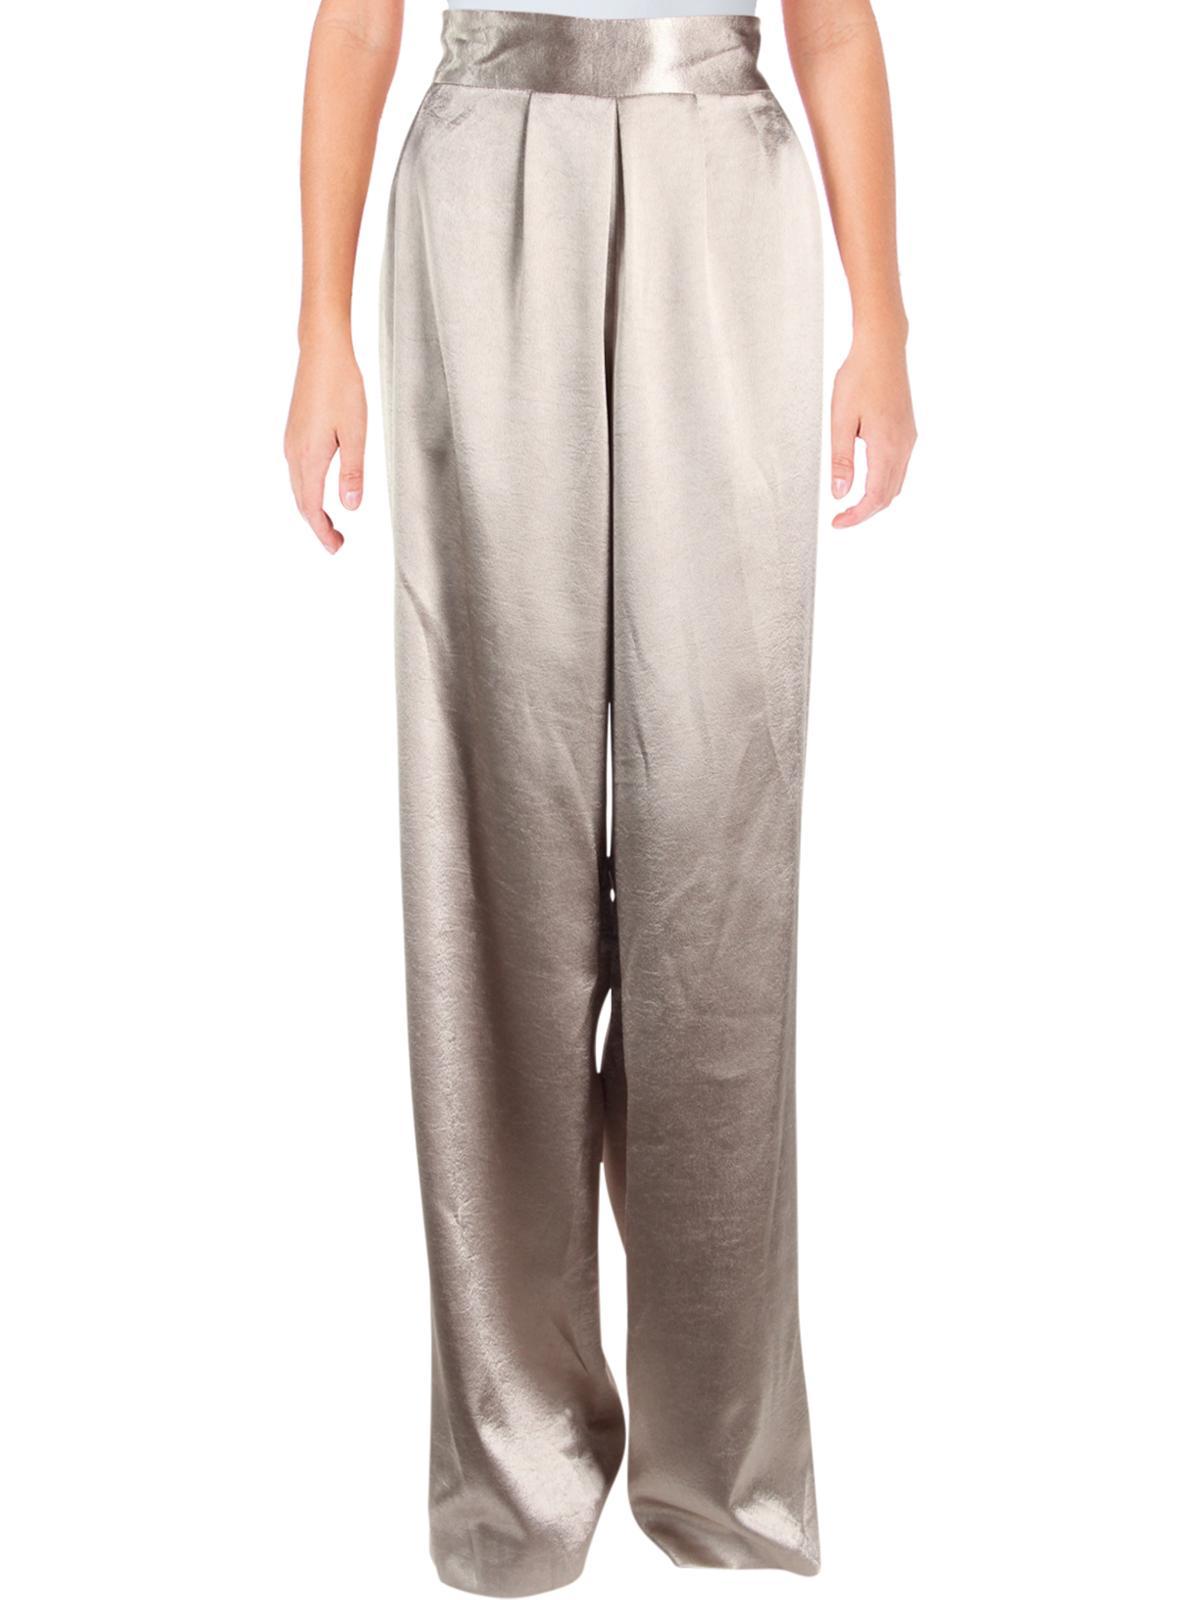 Ramy Brook Womens Iris Satin Pleated Dress Pants